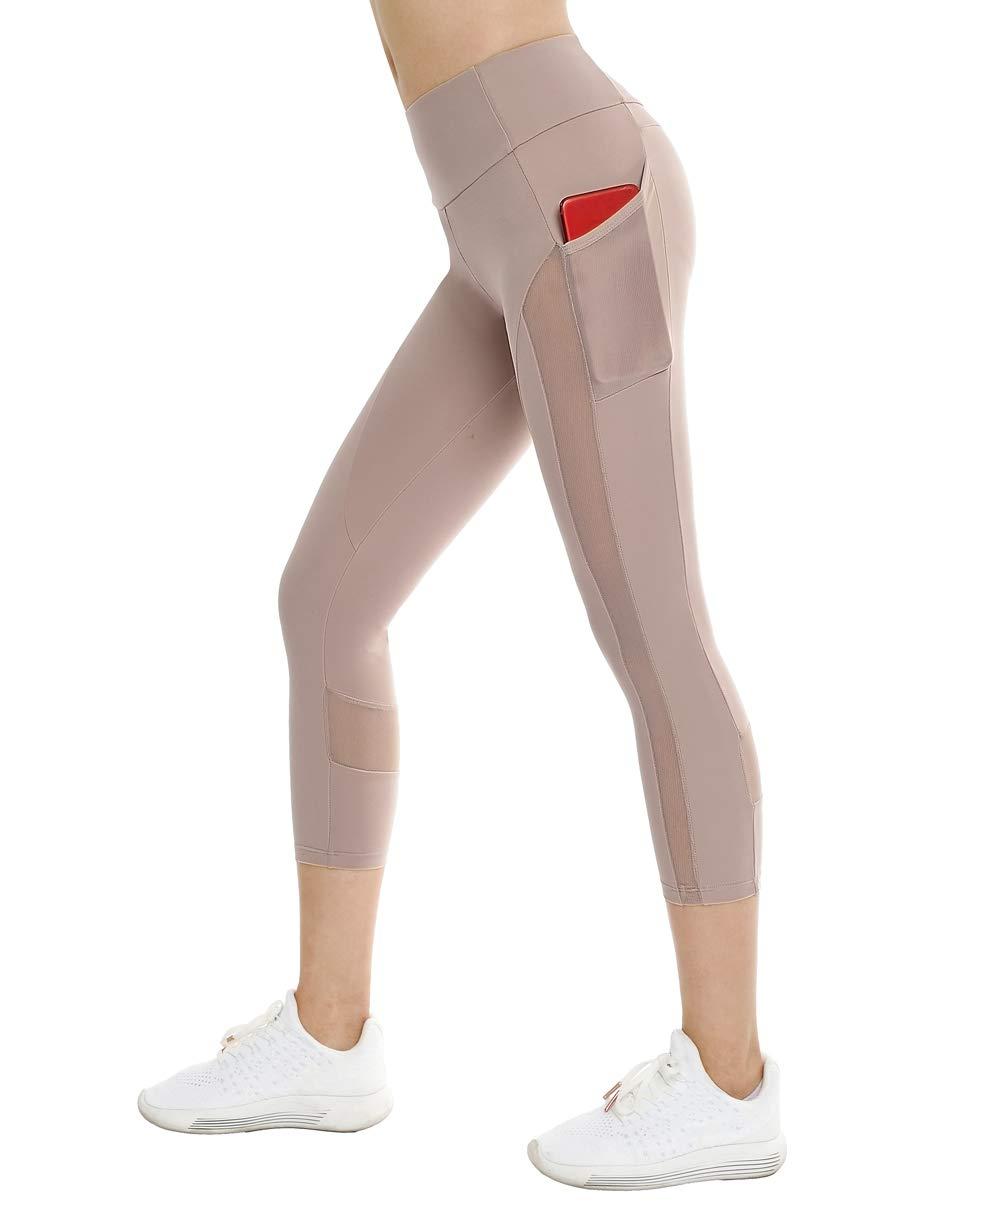 9ebebad4b67eb Best Rated in Women s Running Pants   Helpful Customer Reviews ...